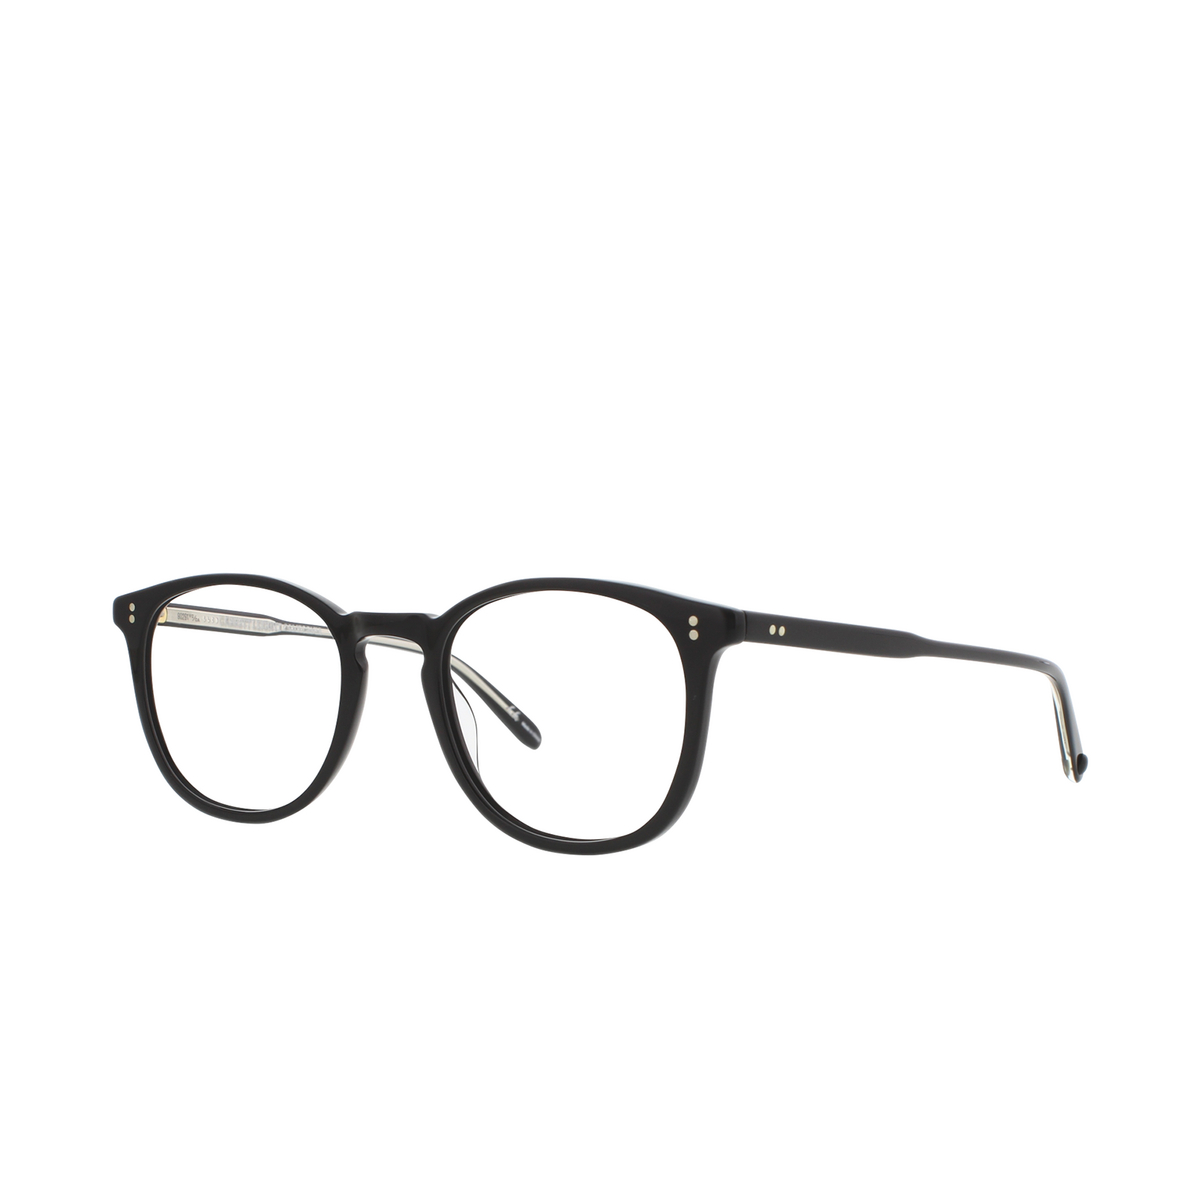 Garrett Leight® Round Eyeglasses: Kinney color Matte Black Mbk - three-quarters view.